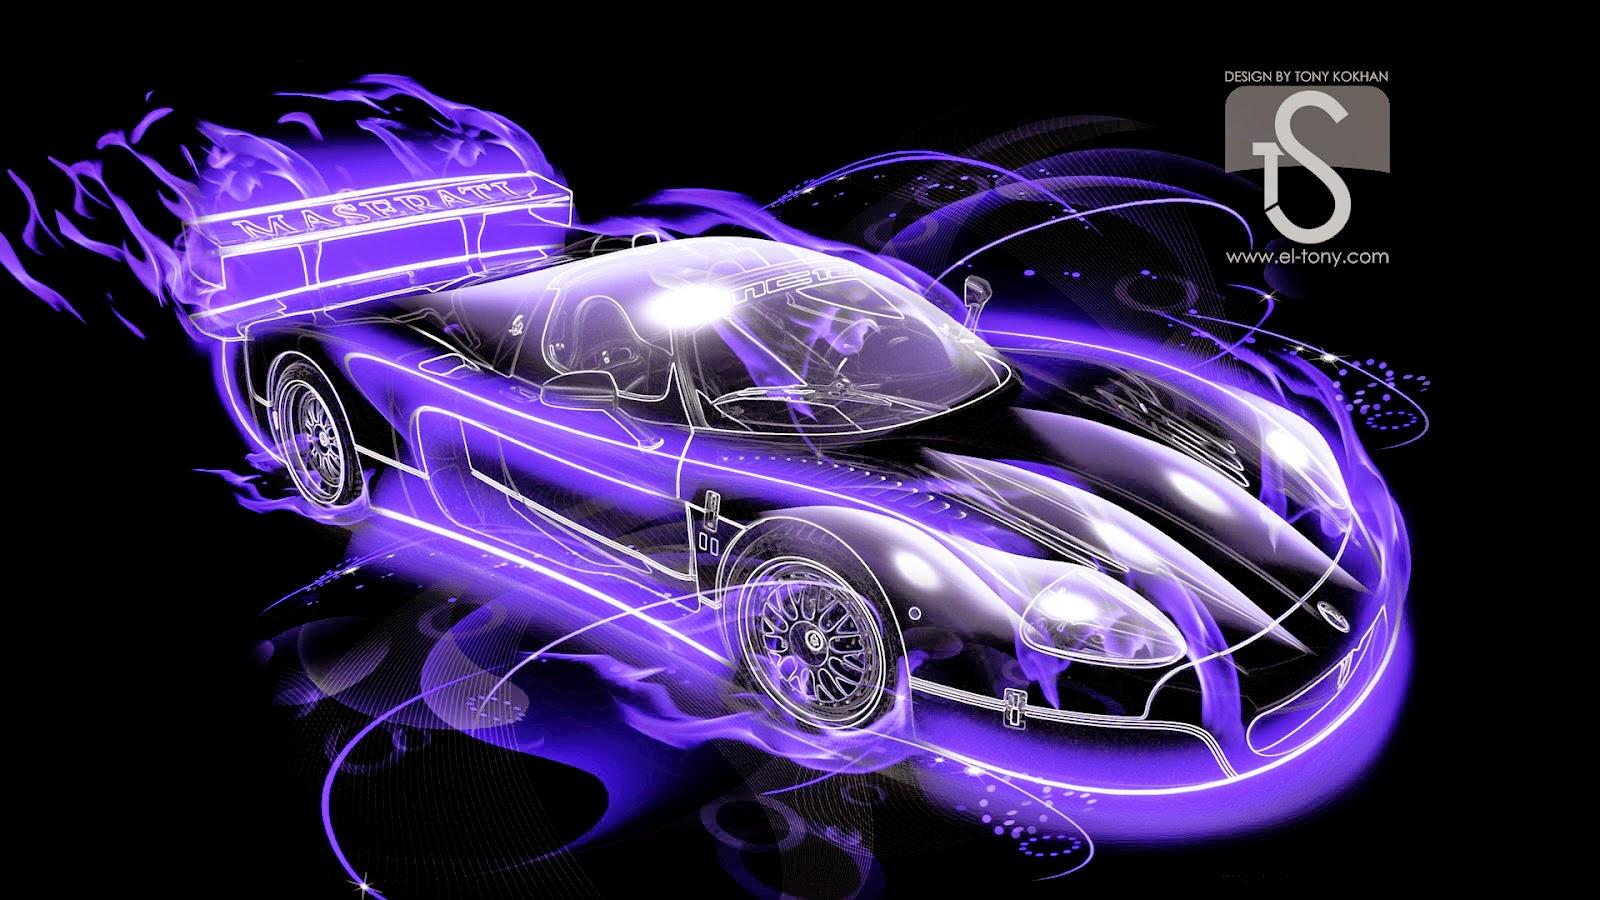 fire 3d s of cars for desktop1